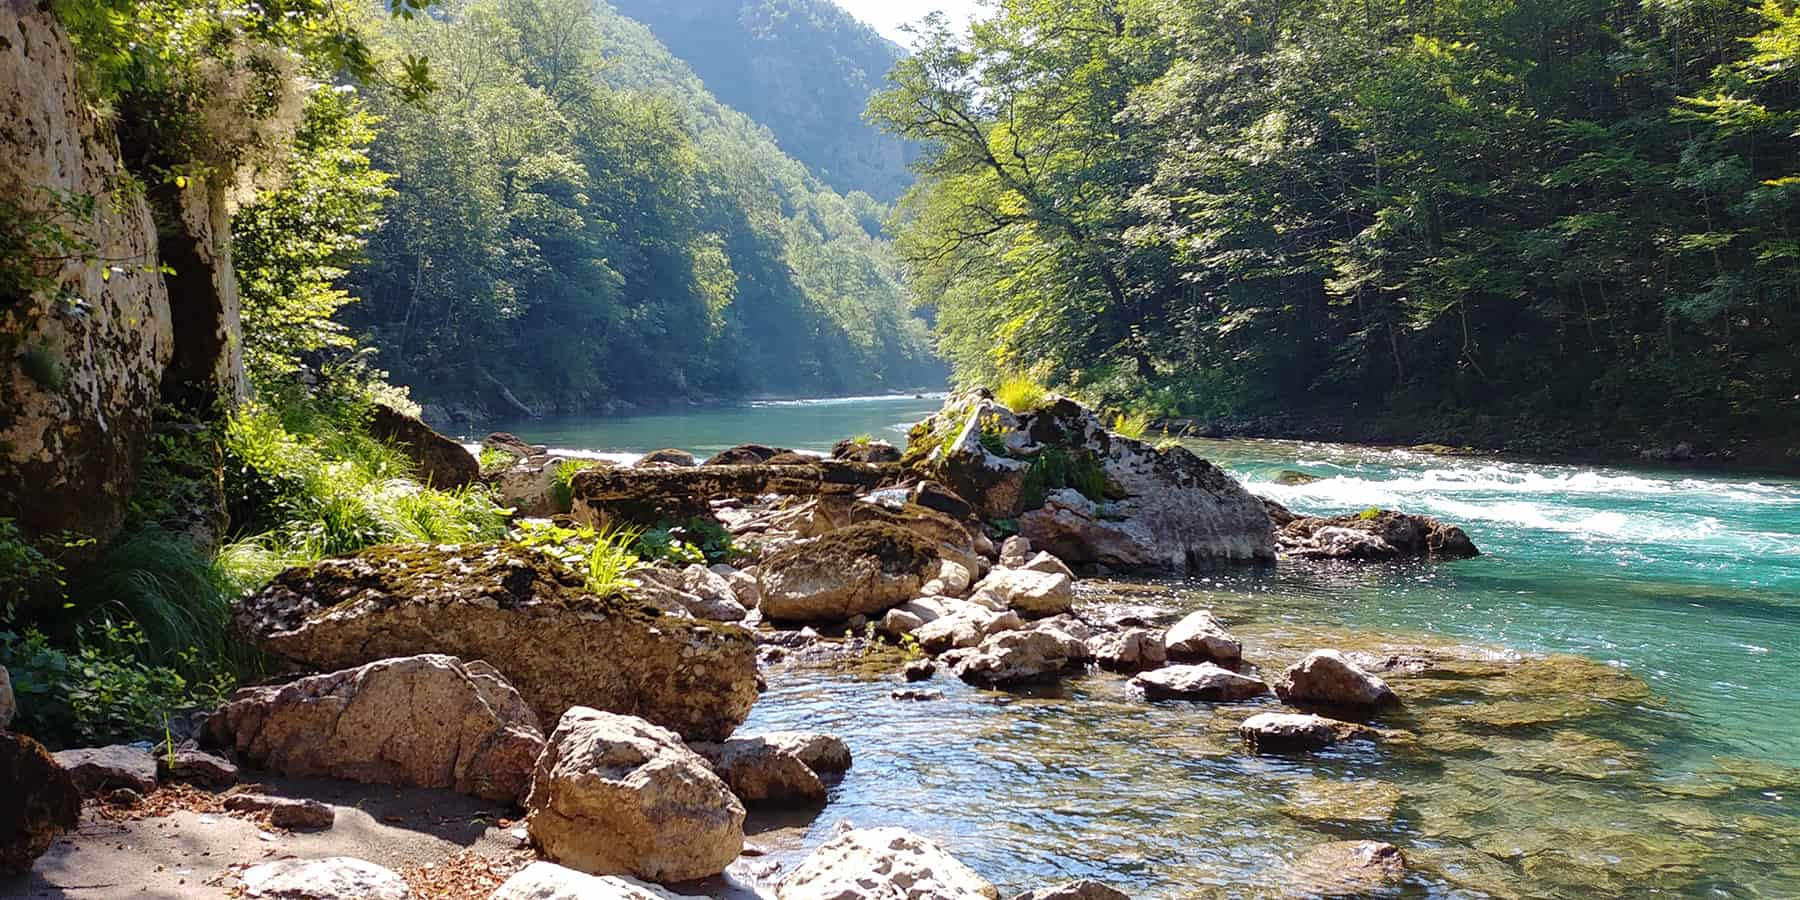 Fly fishing adventure in tara river